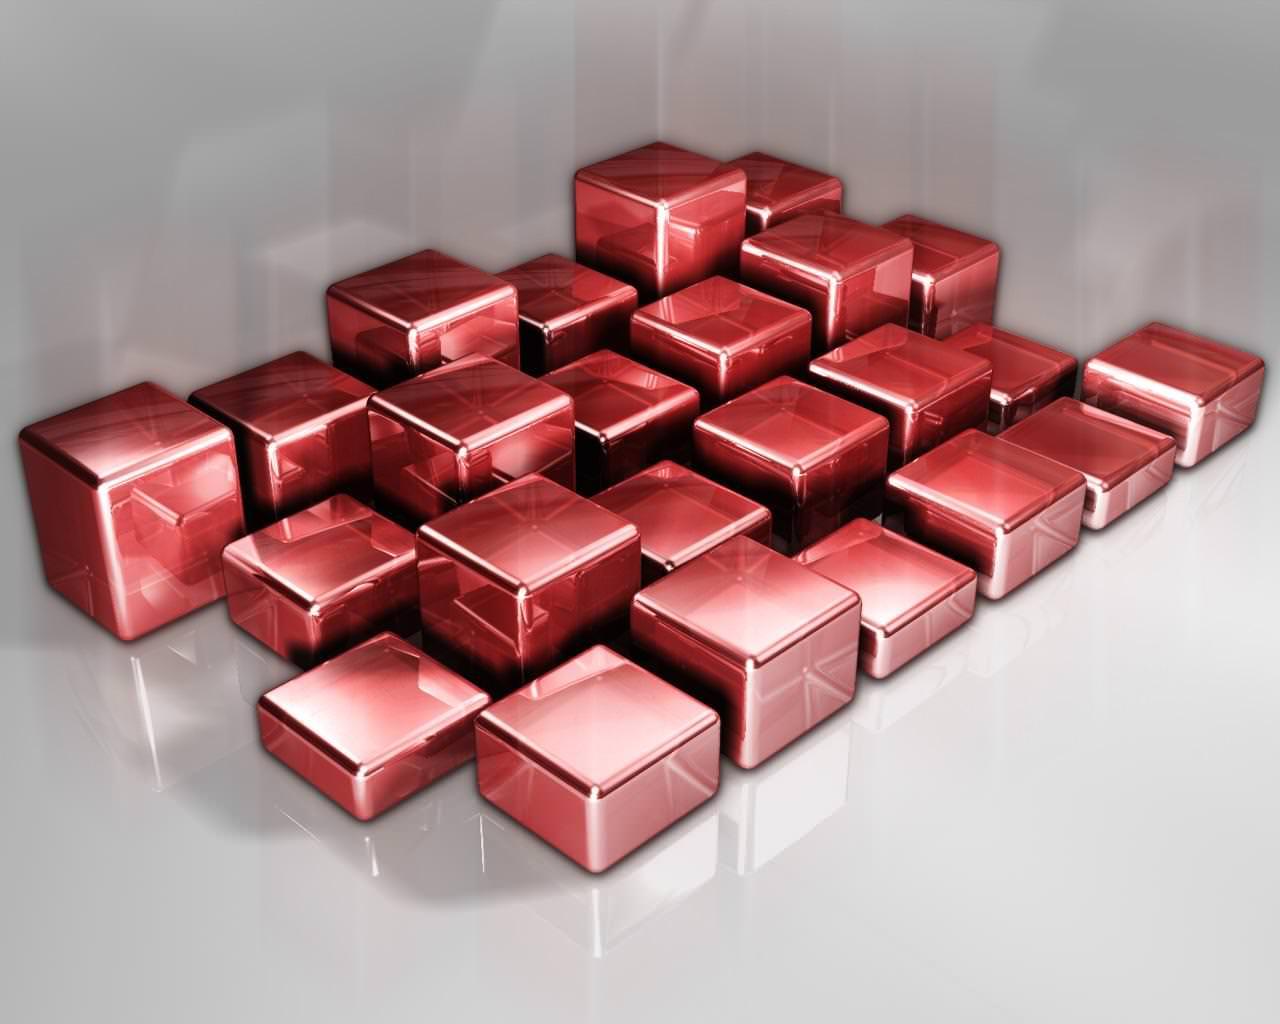 Red Cubes Wallpaper